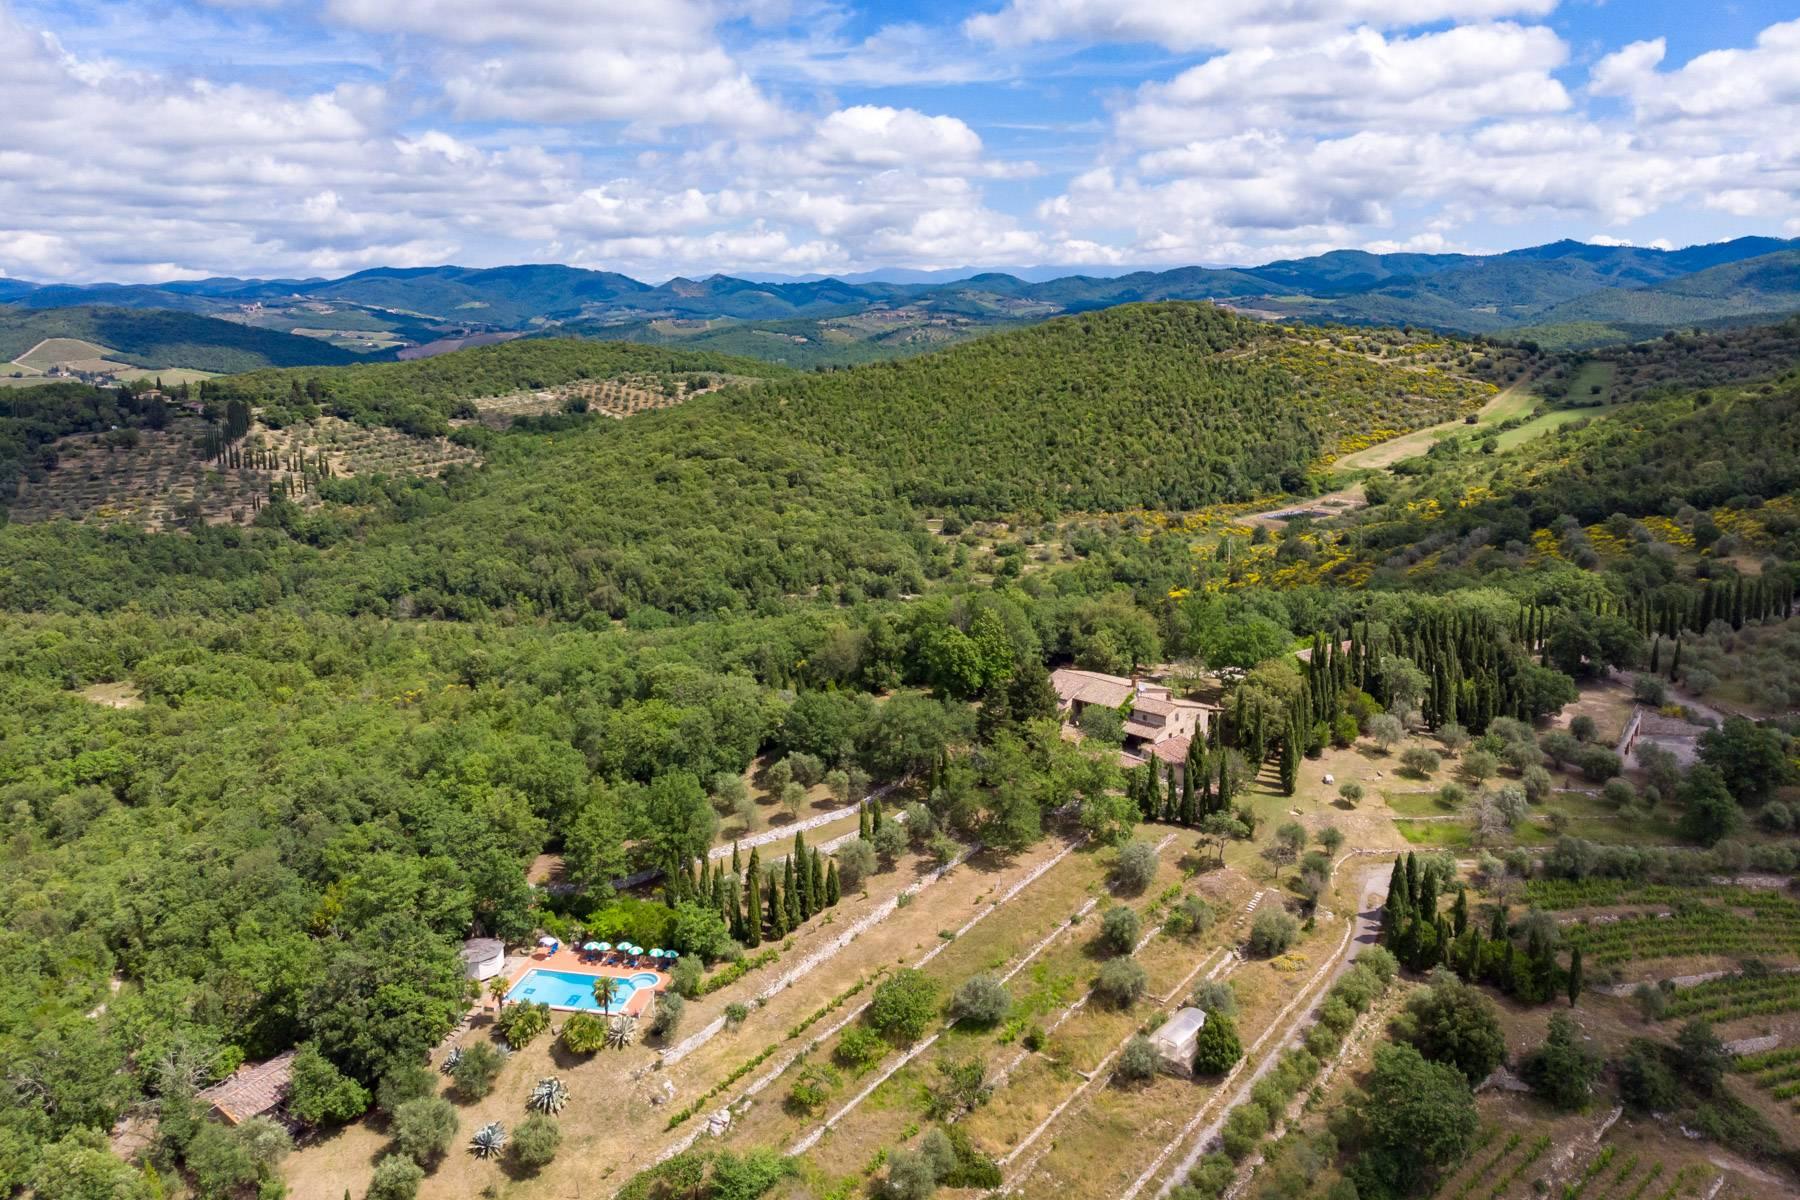 Villa in Vendita a Gaiole In Chianti: 5 locali, 465 mq - Foto 12